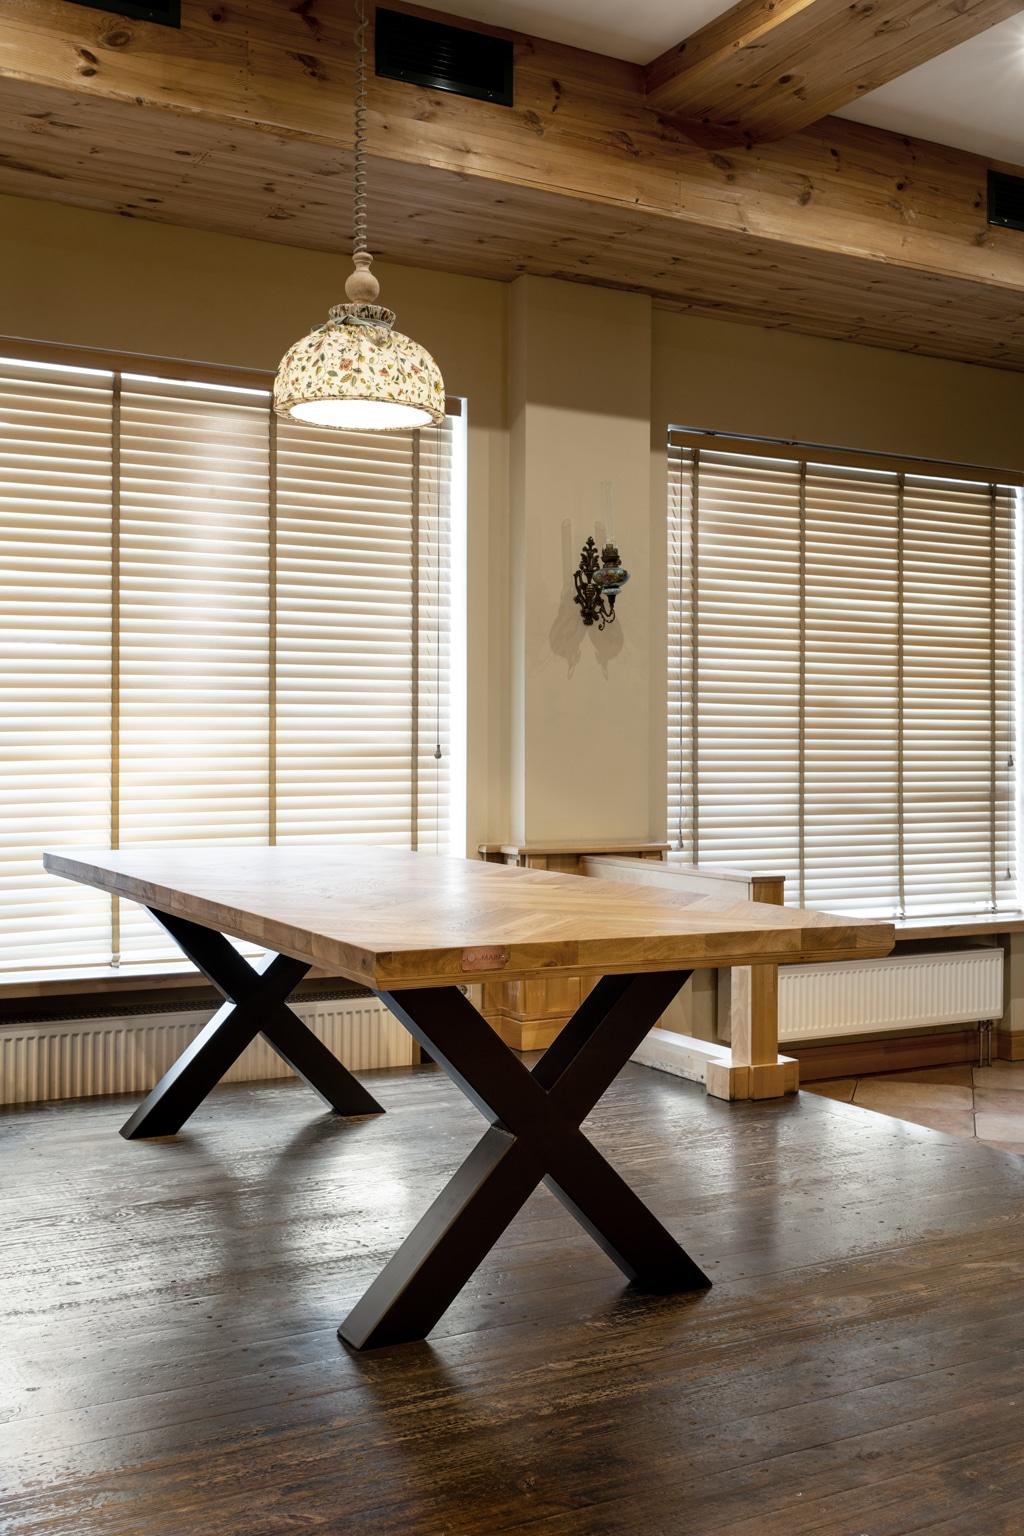 Runde Tischplatte / ovale Tischplatte